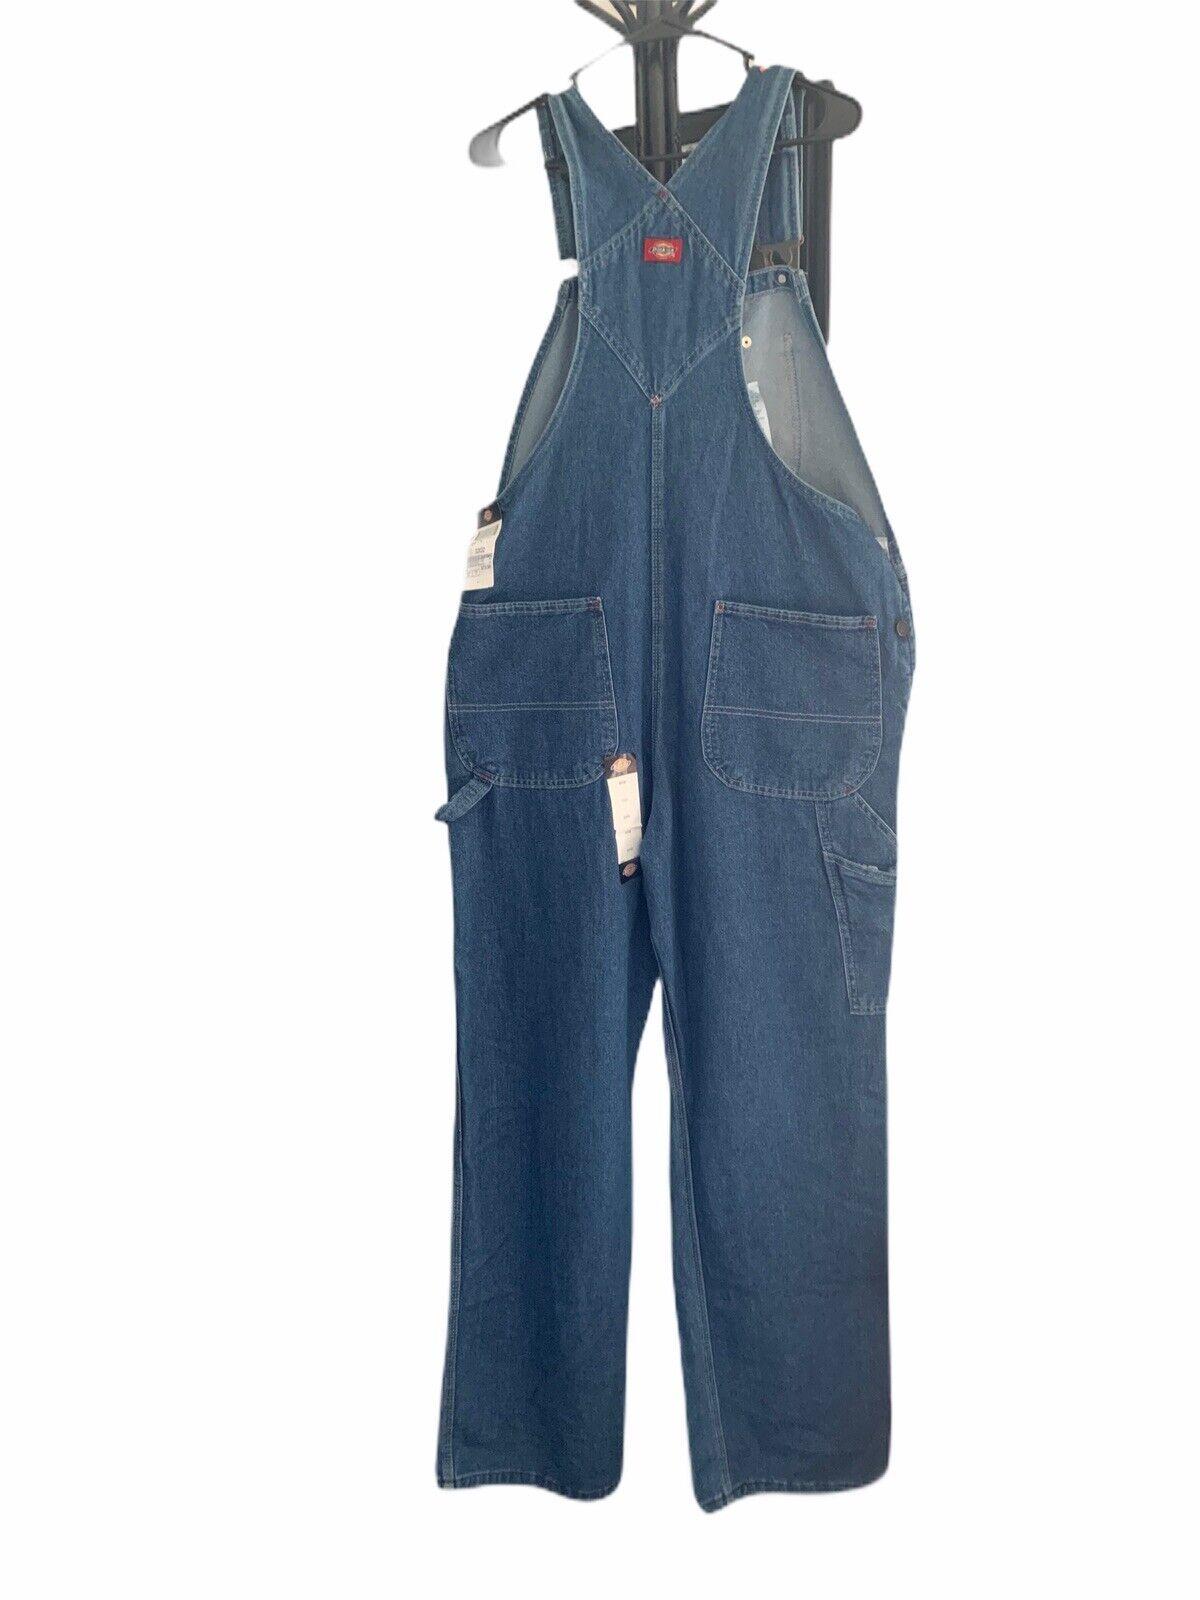 dickies overalls mens - image 2